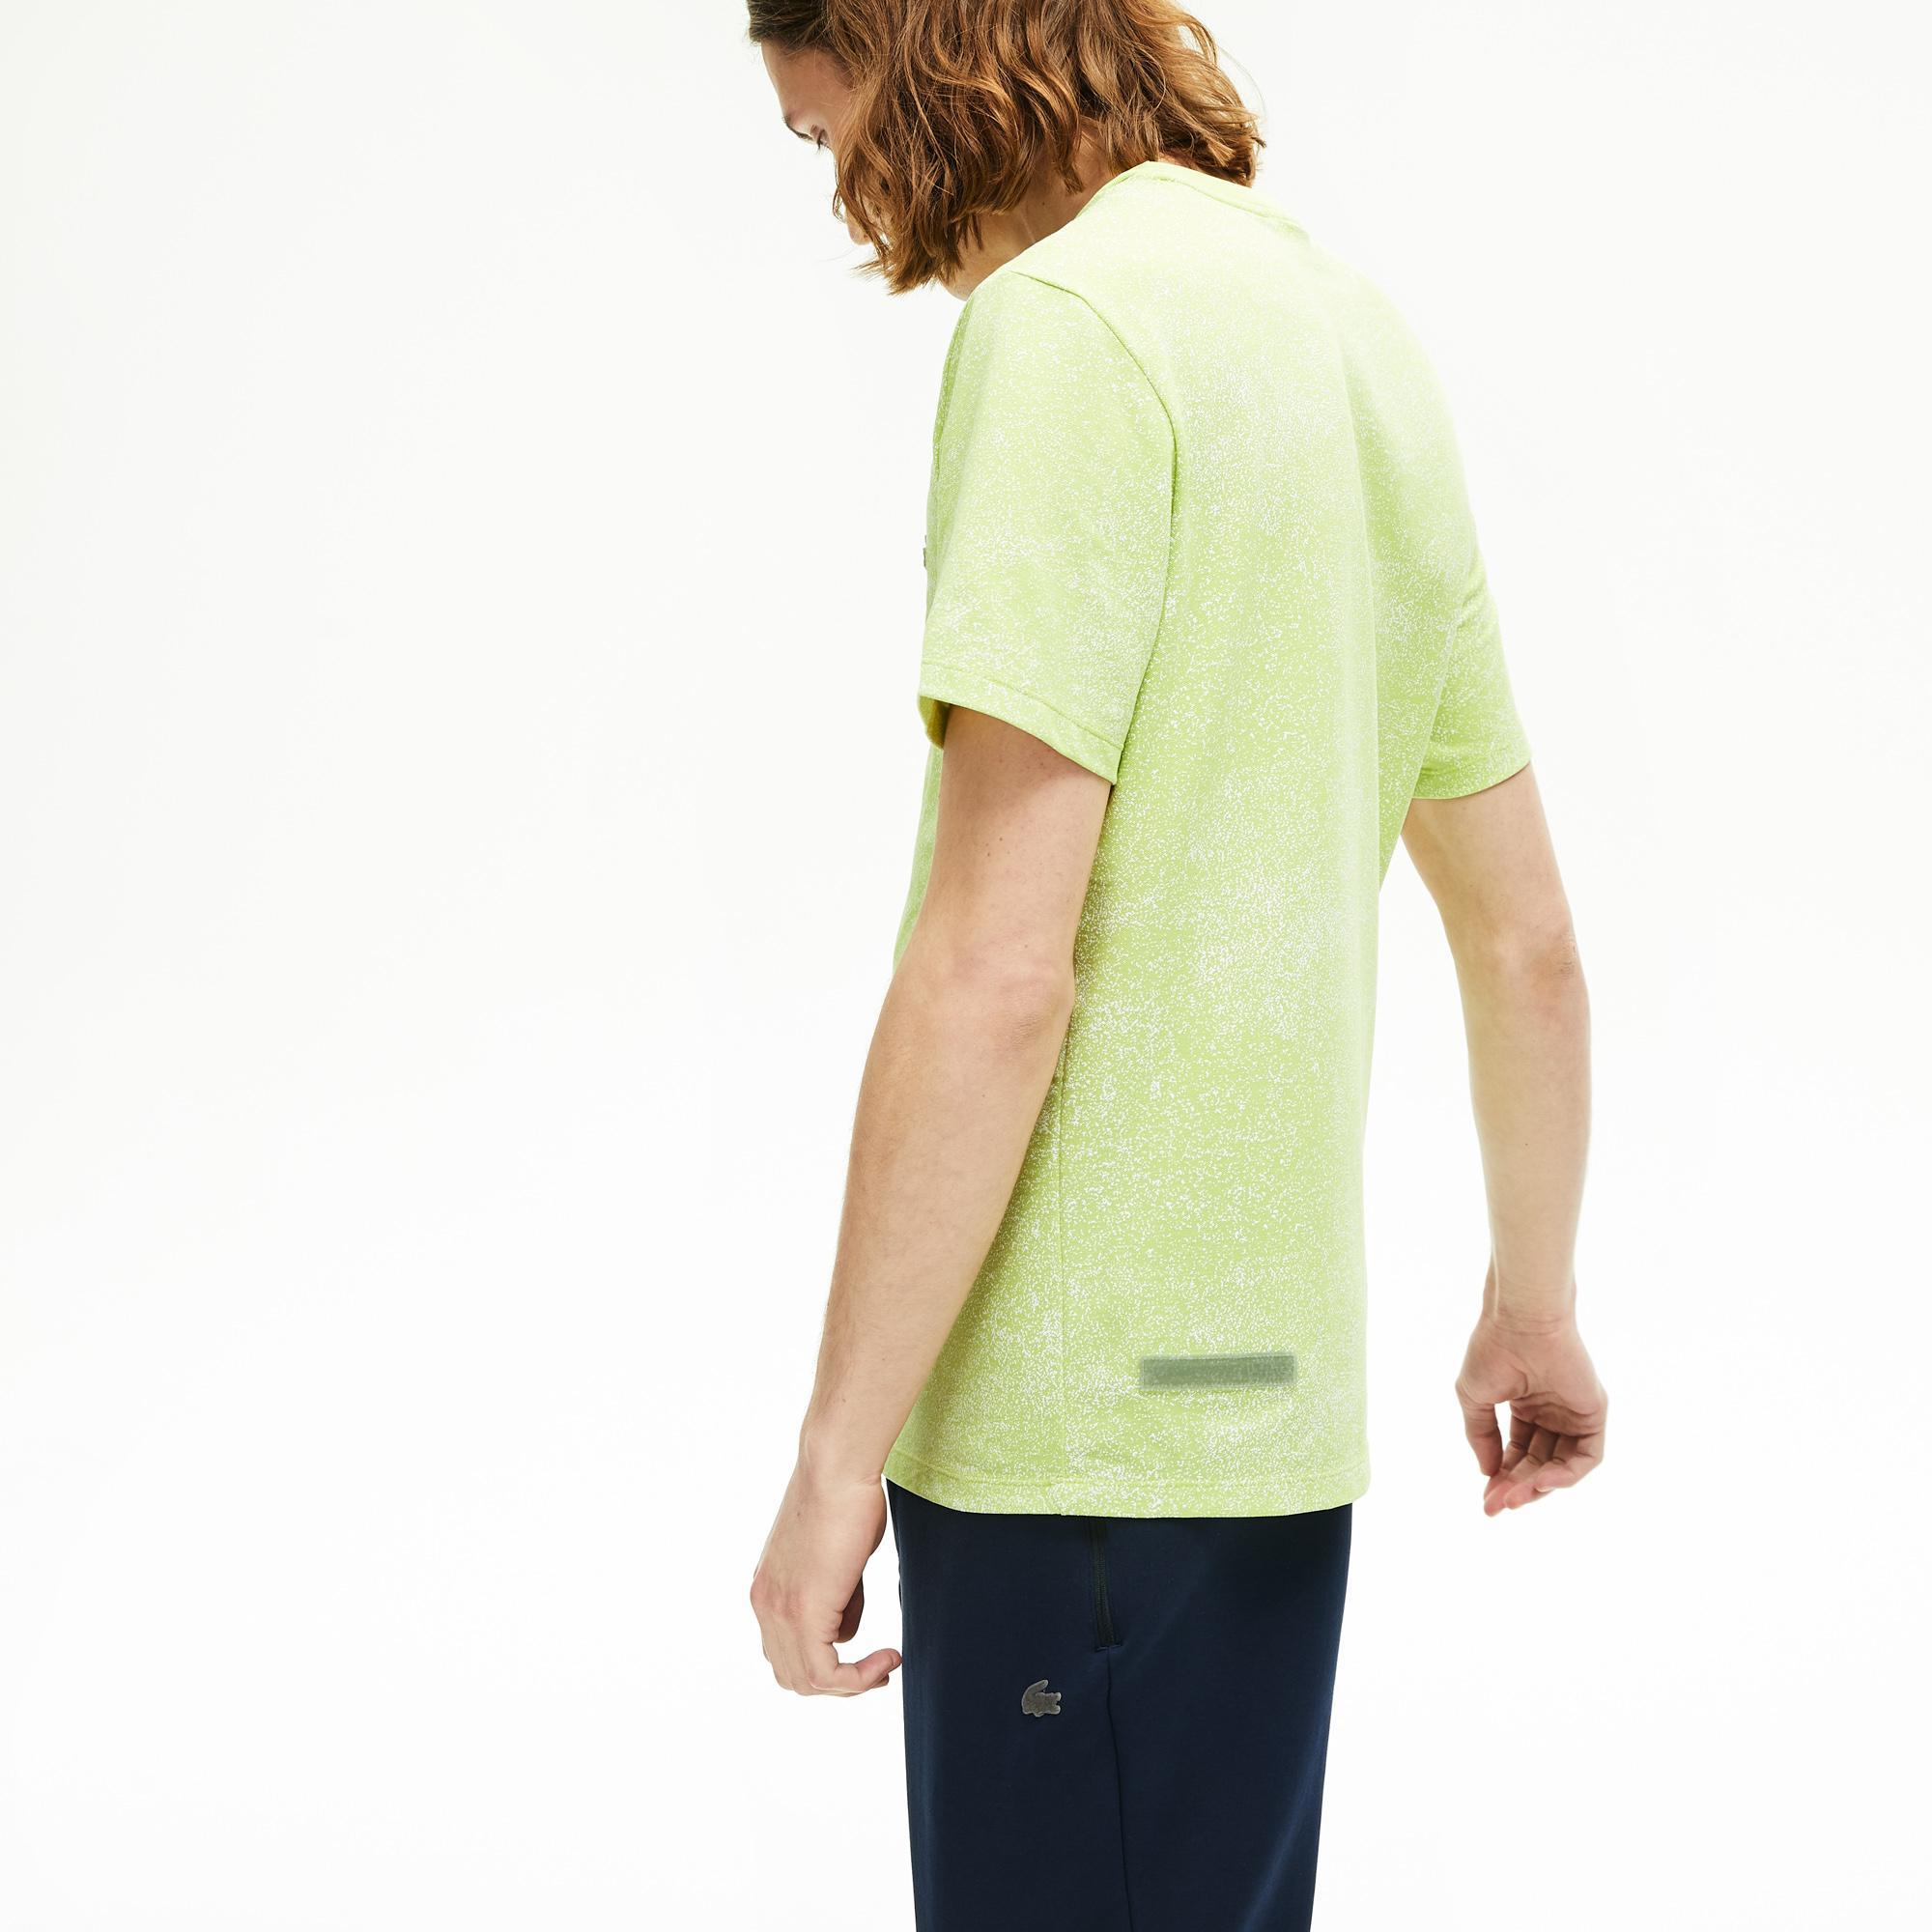 Lacoste Men's Motion Ultra-Light Crew Neck T-Shirt